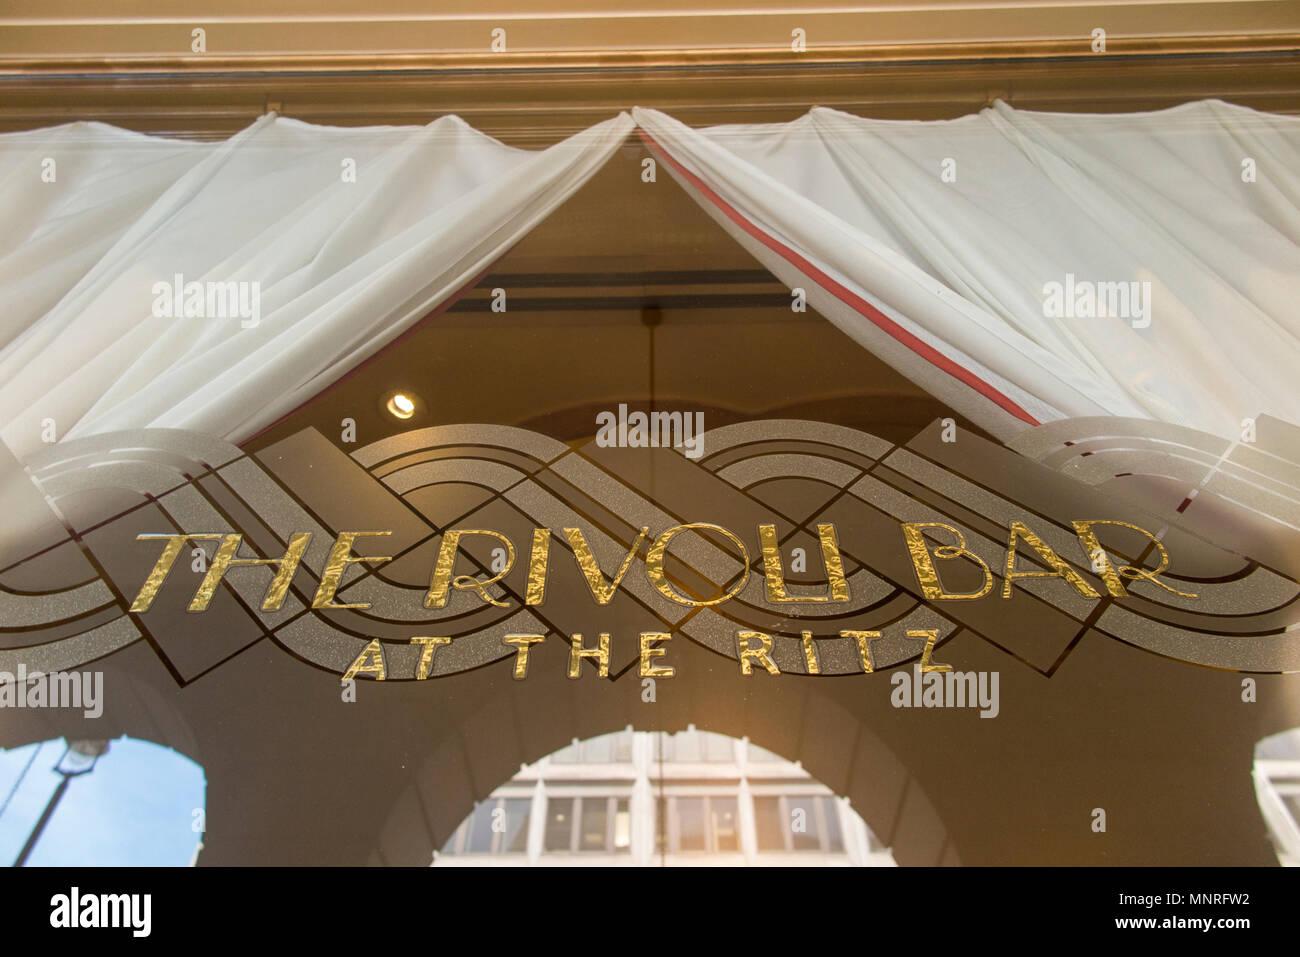 The famous Rivoli Bar at the Ritz Hotel in London - Stock Image